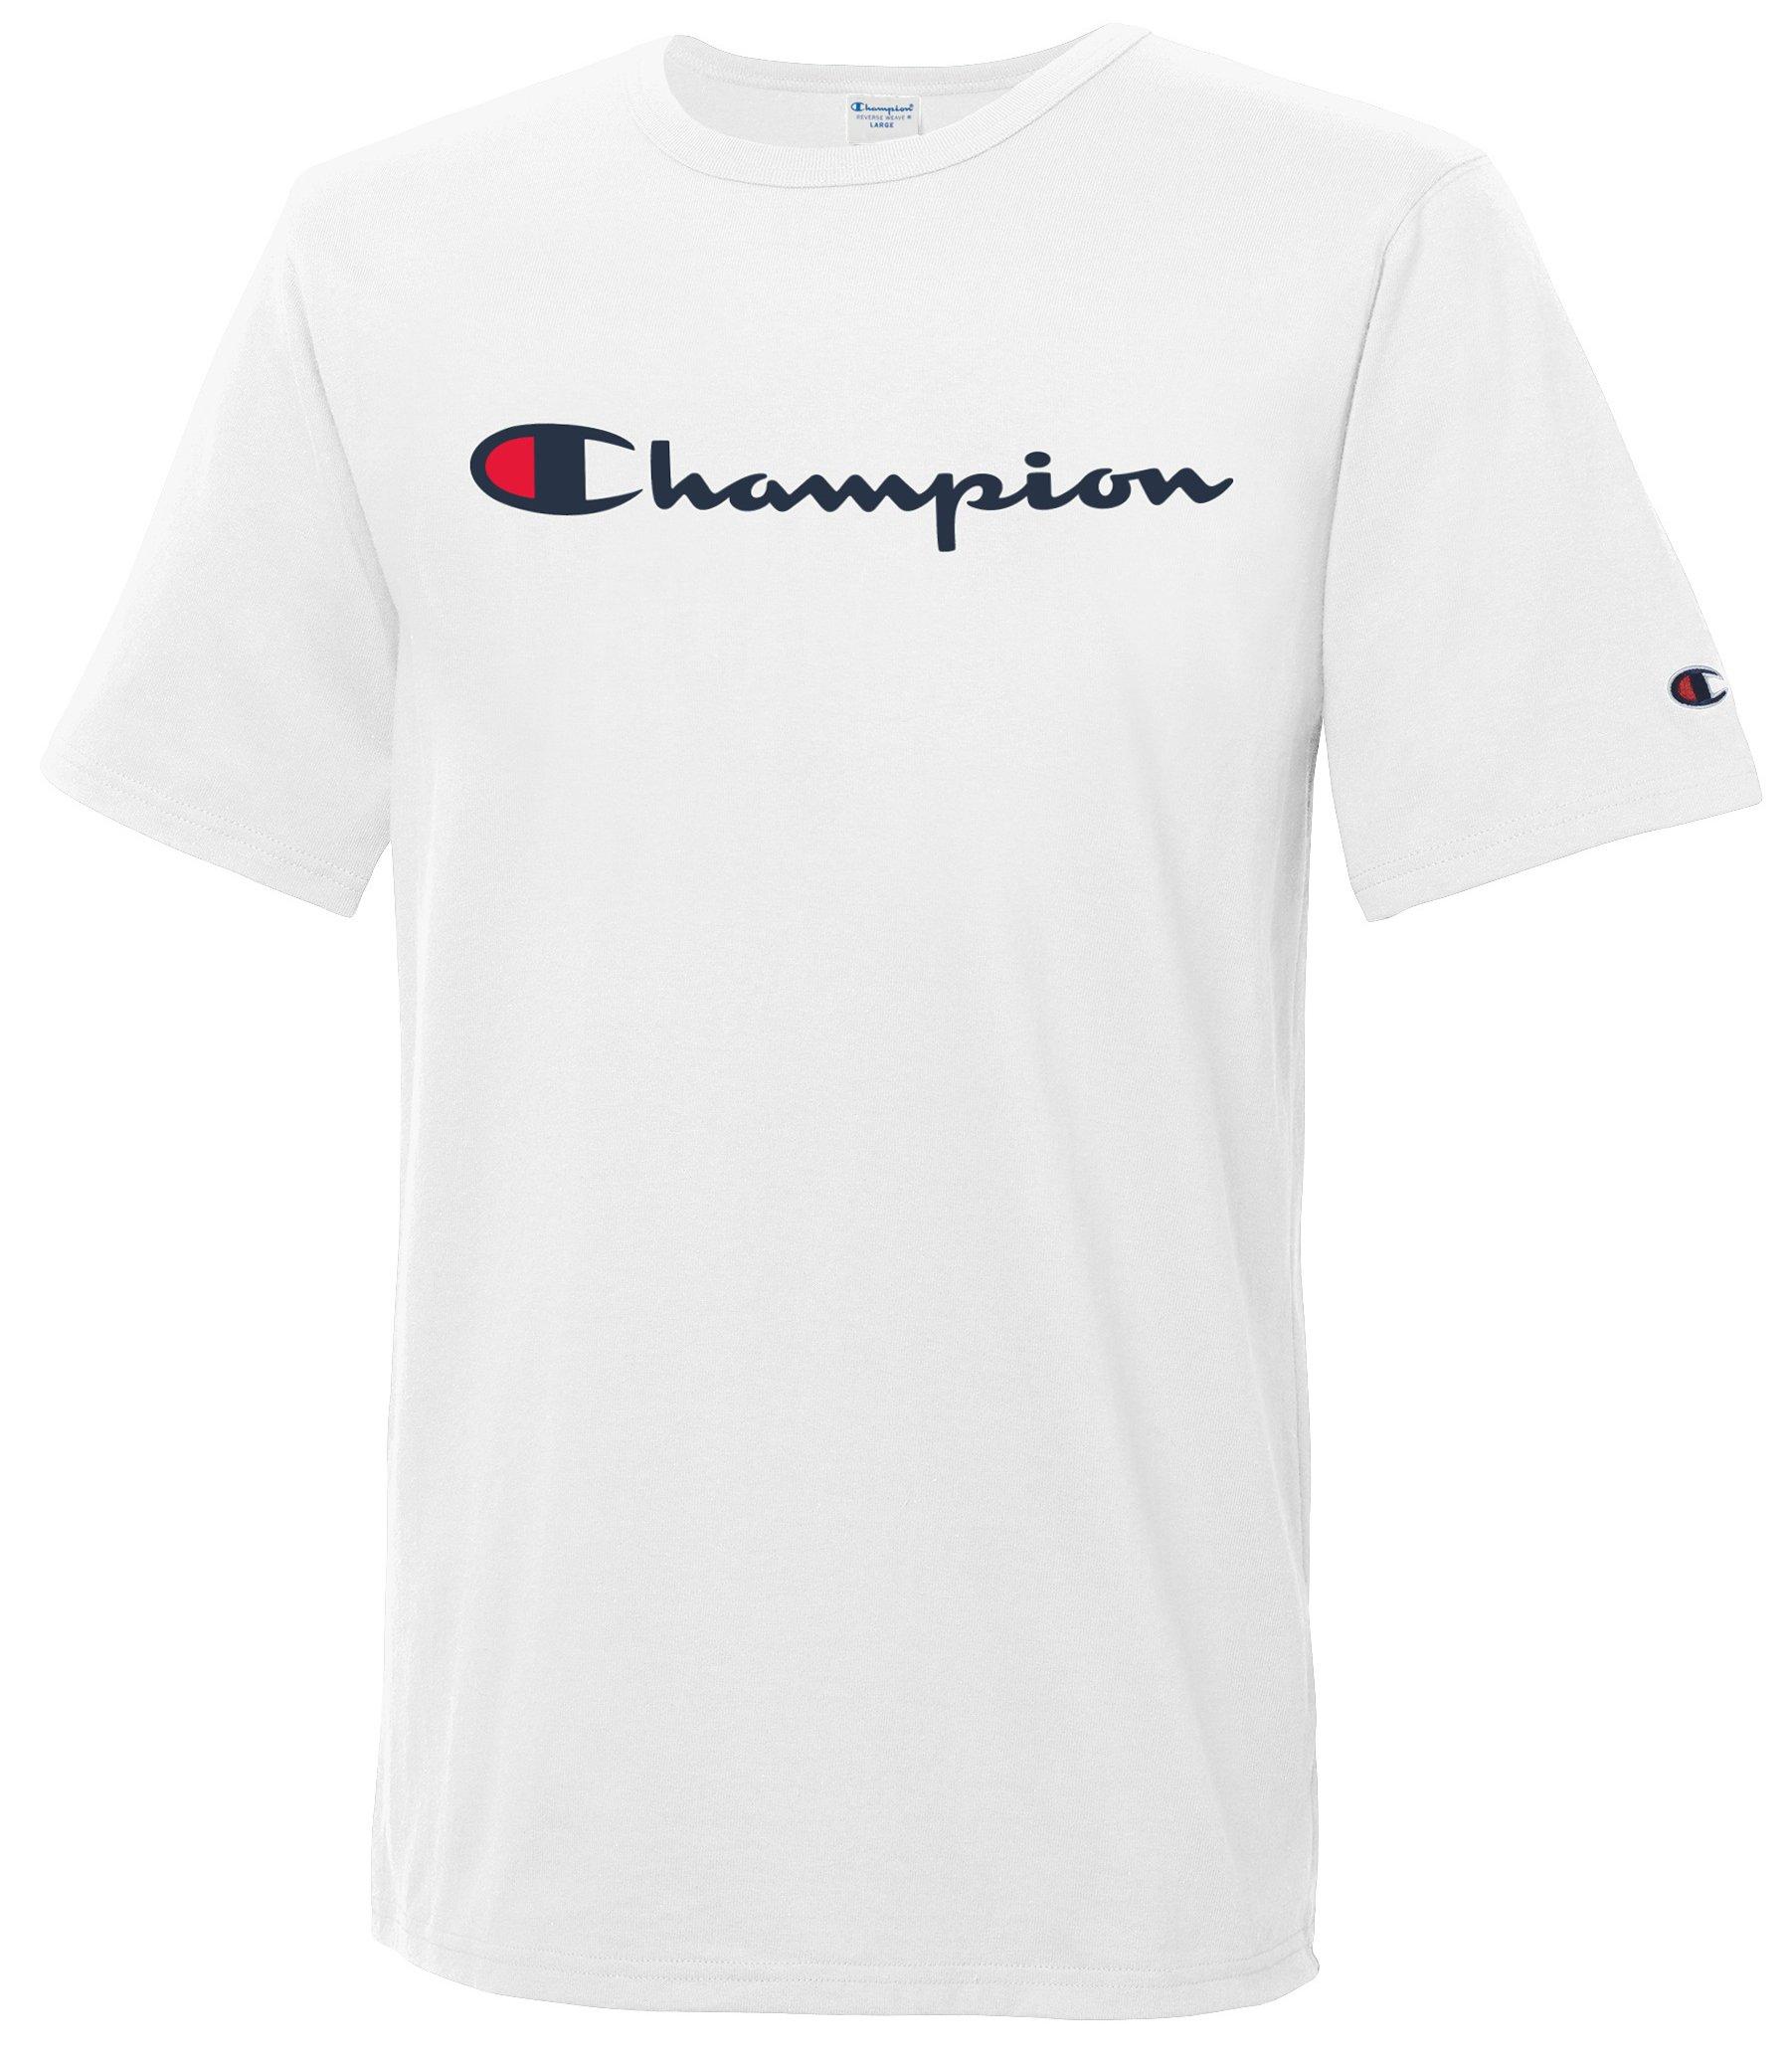 Champion LIFE Men's Heritage Tee, White/Patriotic Champion Script, M